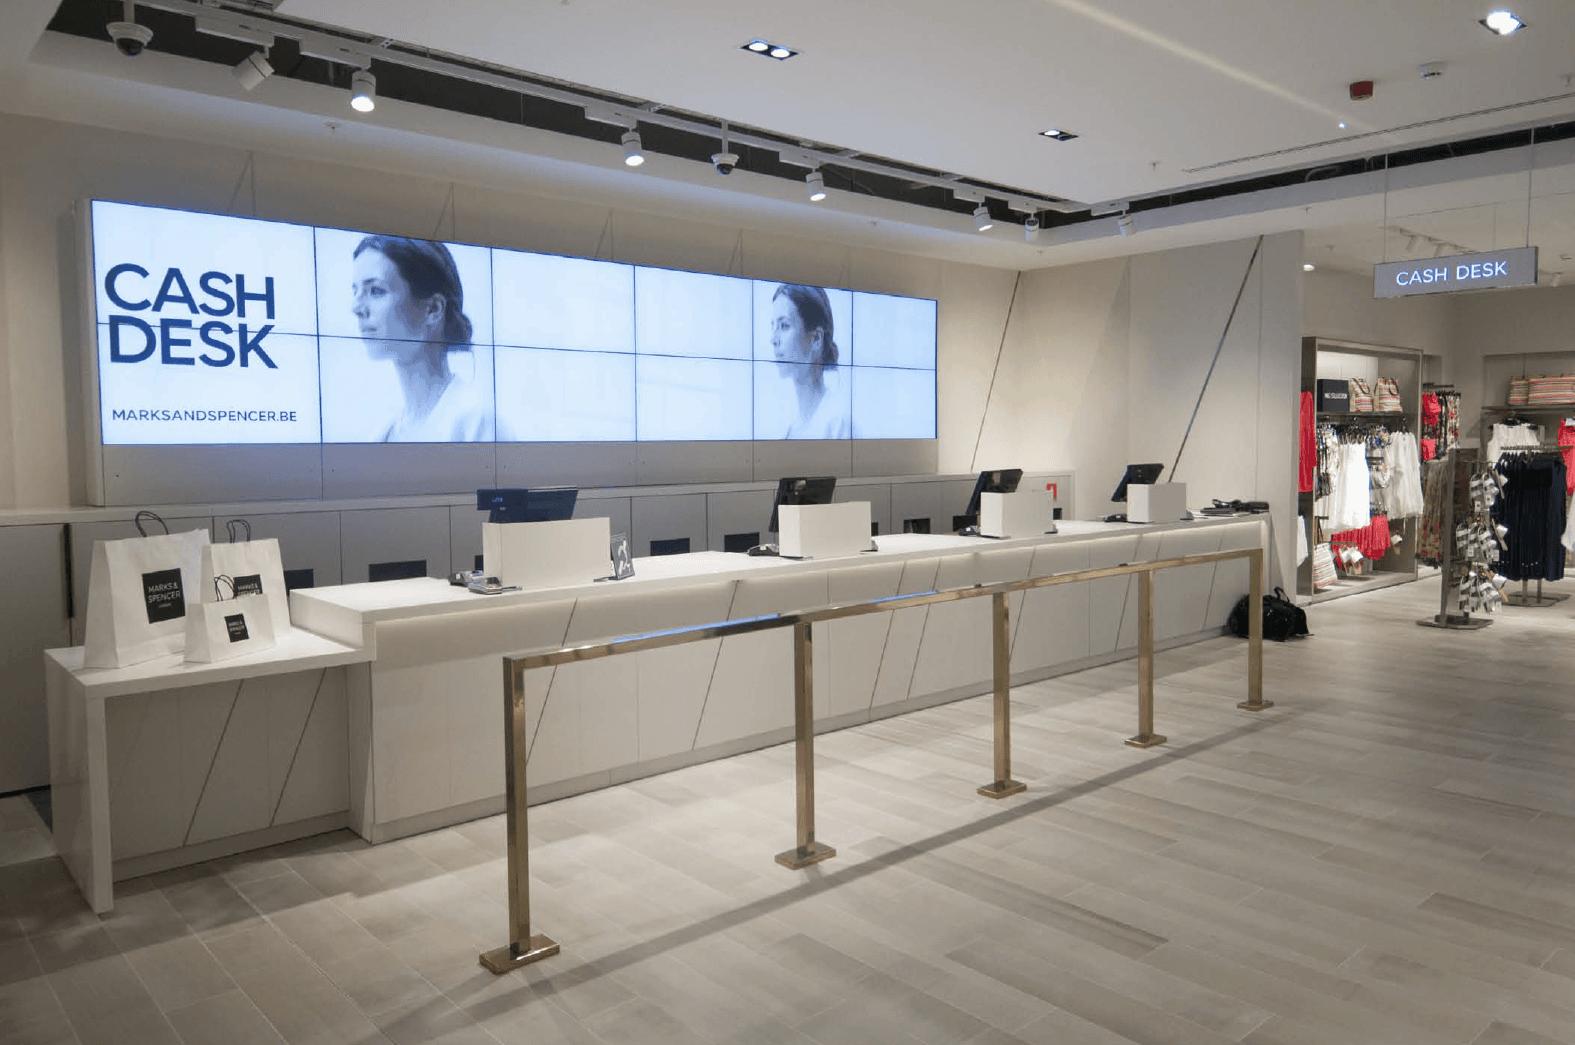 retail lighting design: M&S cash desk